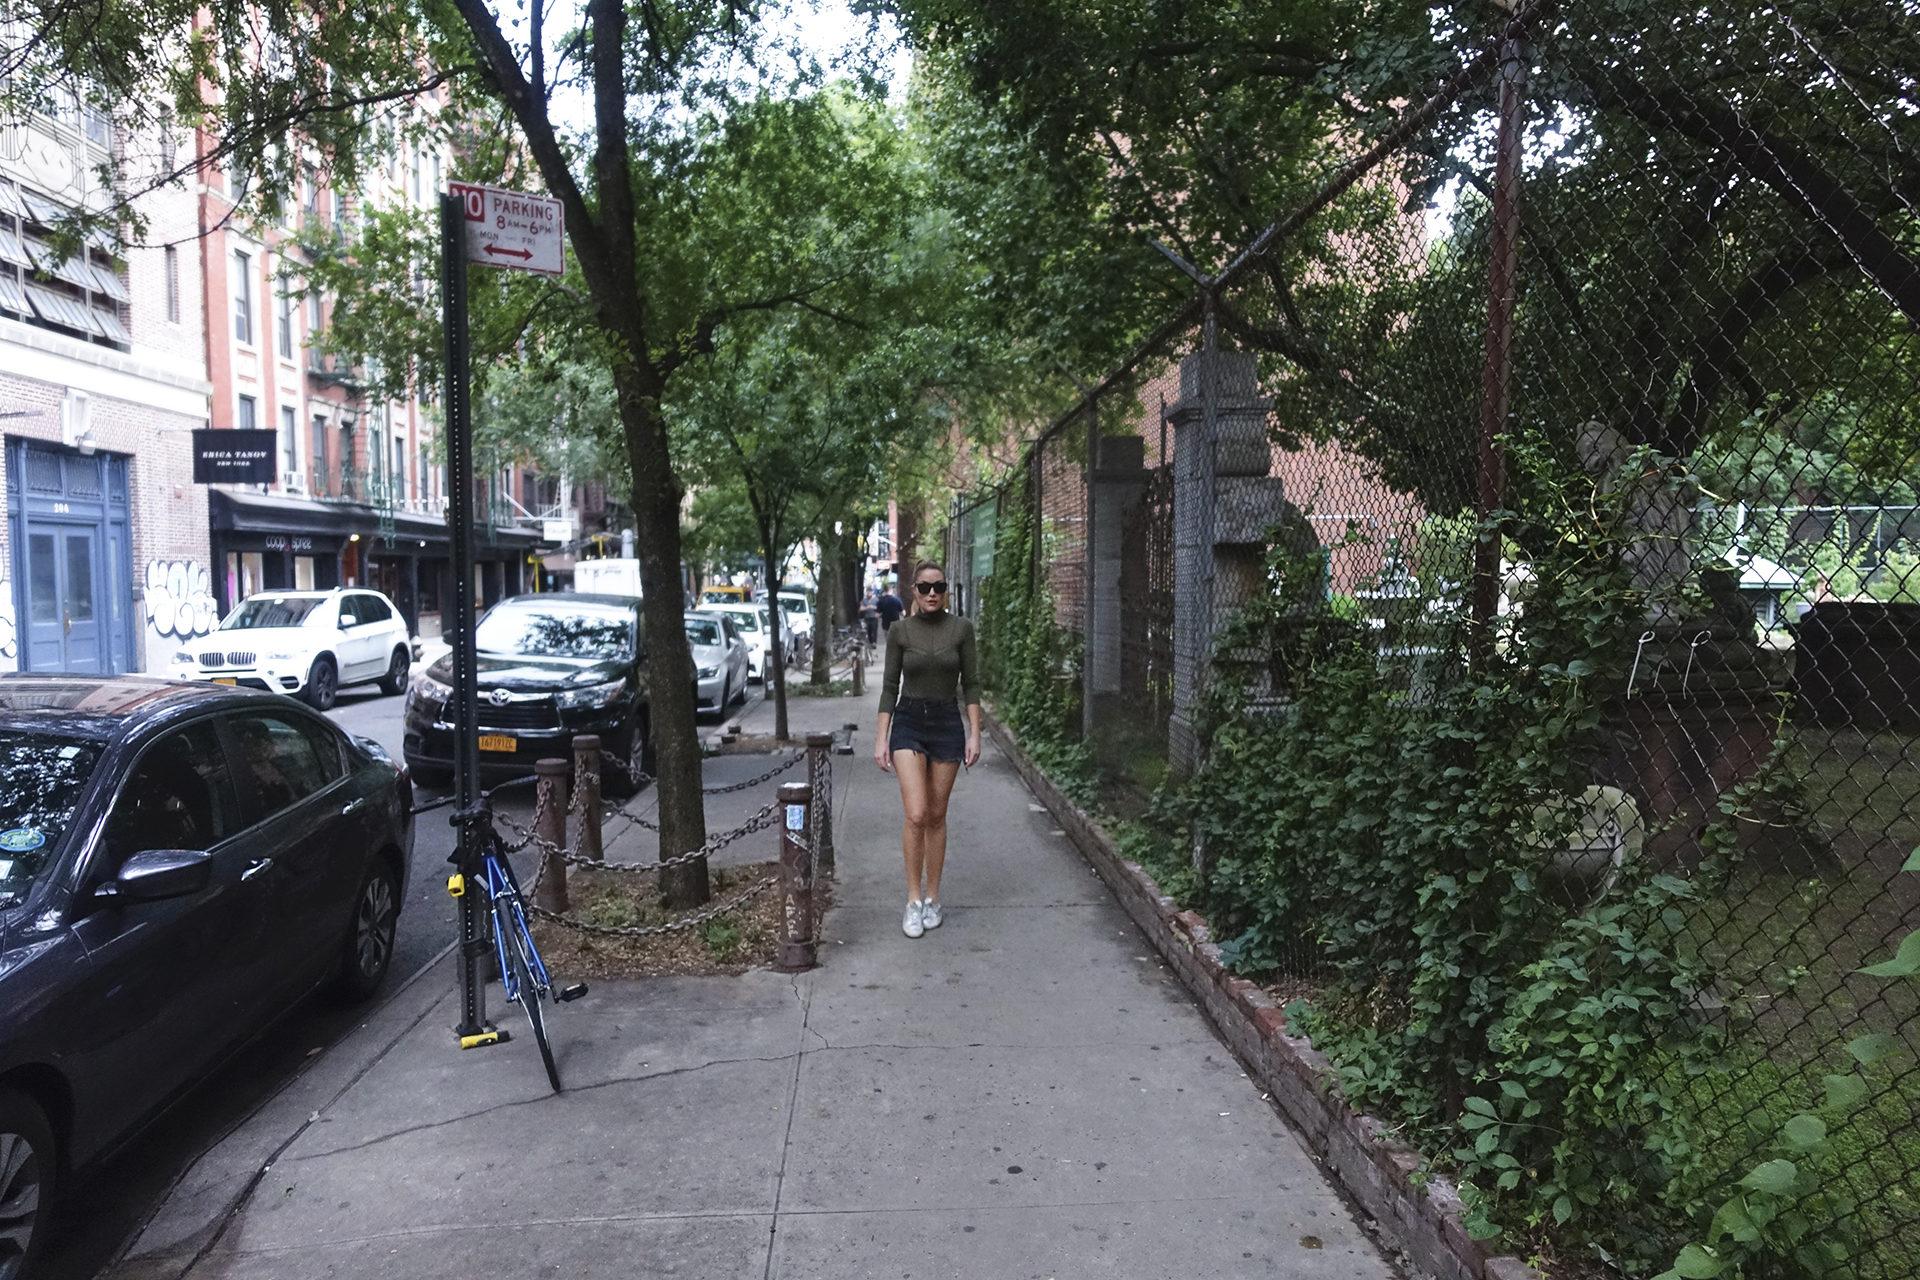 Nolita New York City